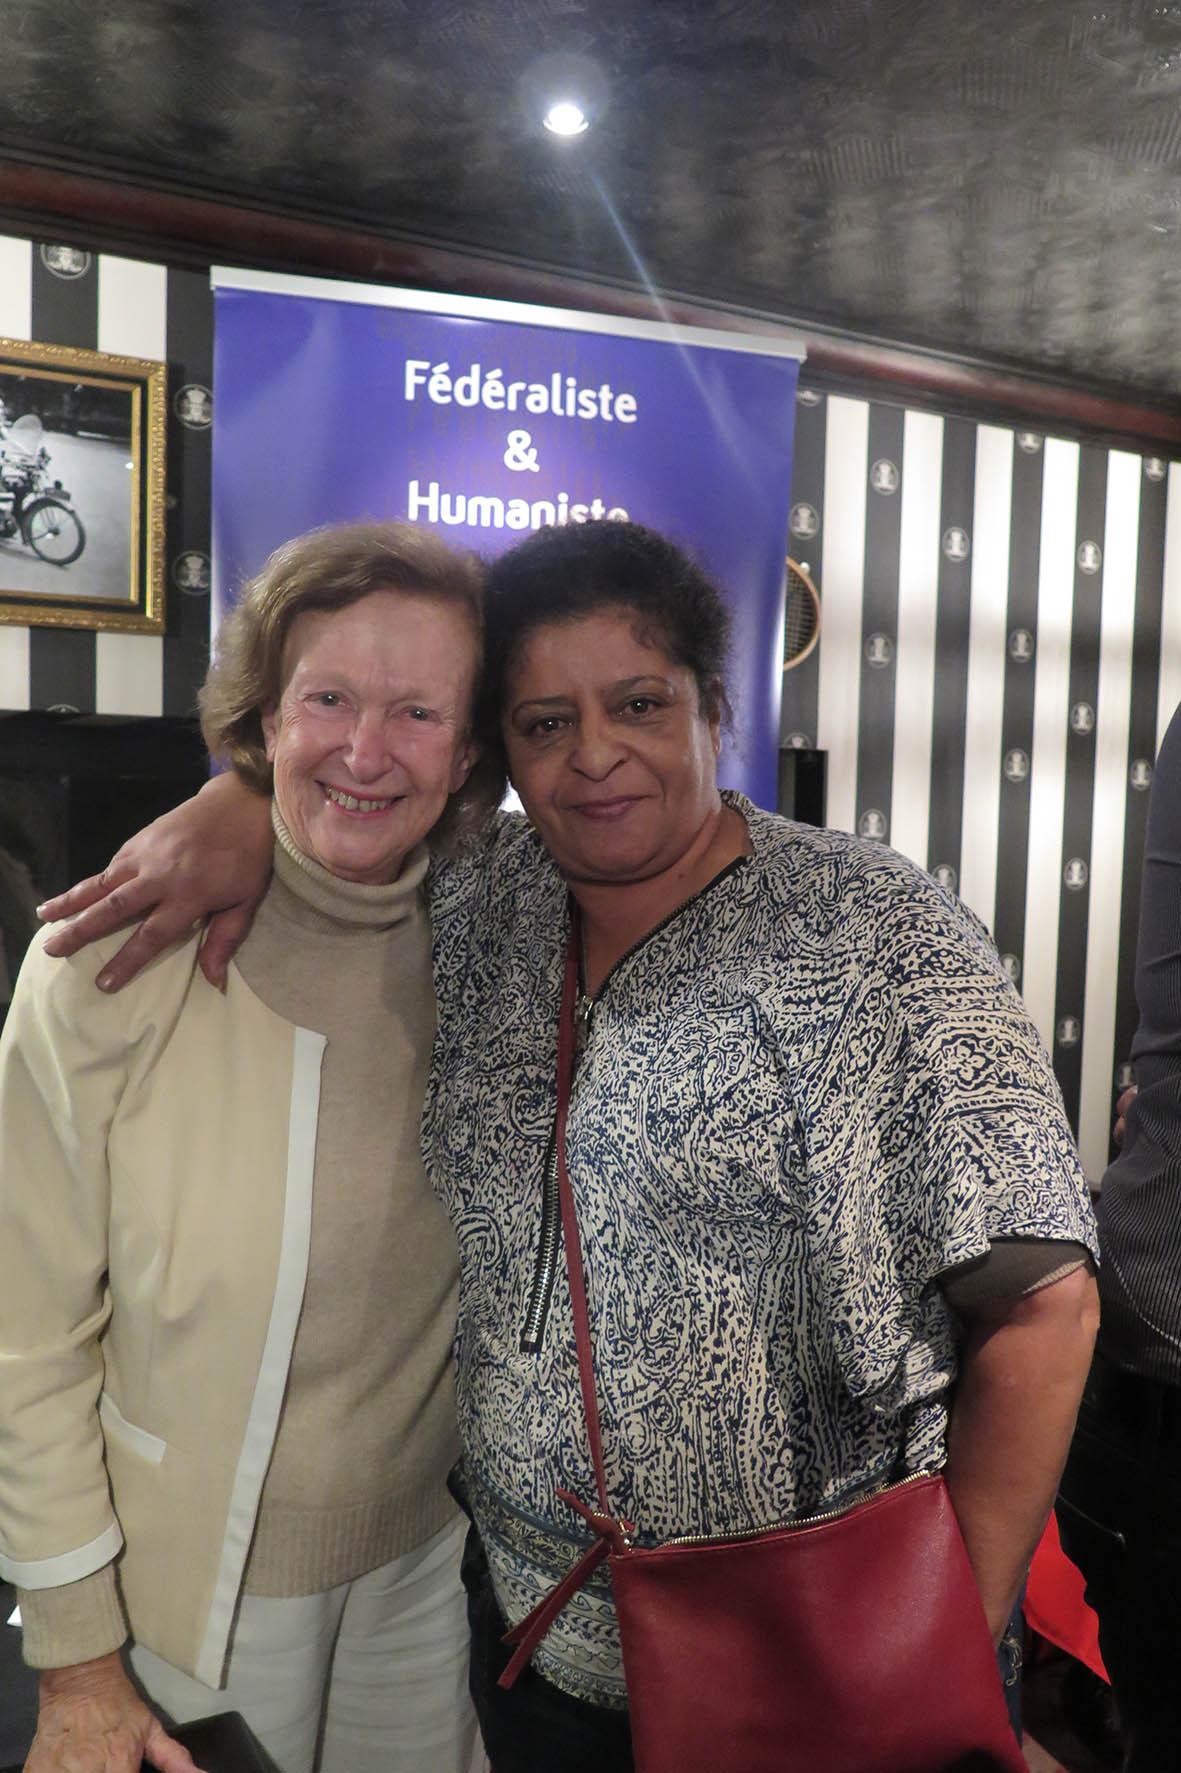 federation-udi-metropole-de-lyon-nicole-fontaine-conference-brexit-20